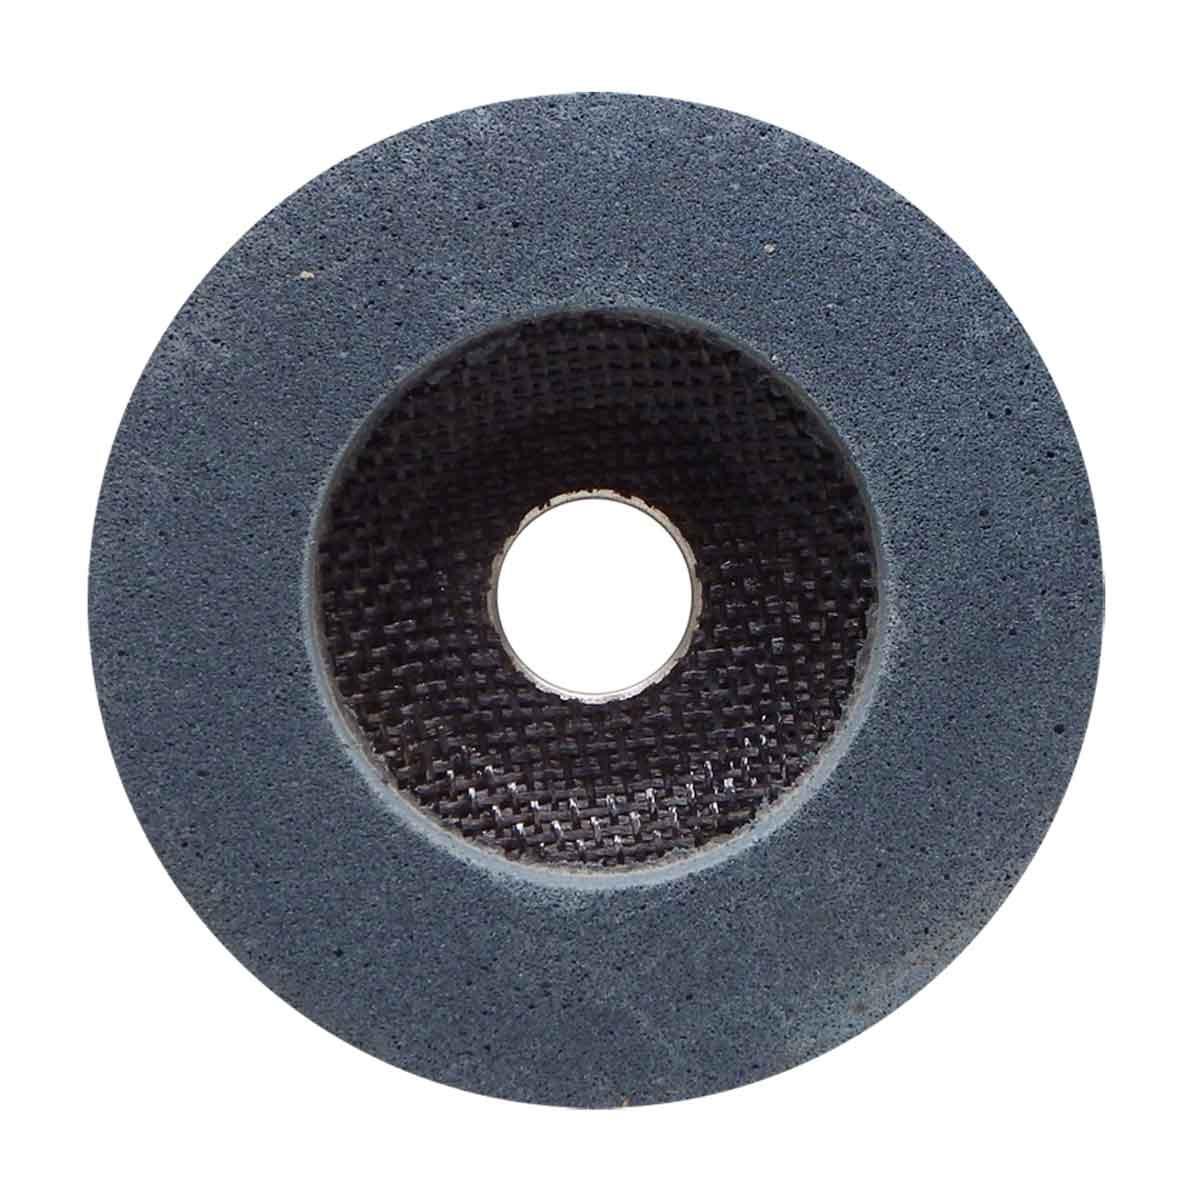 Alpha Tools PVA VP Dry Polishing Disc - Medium Grit